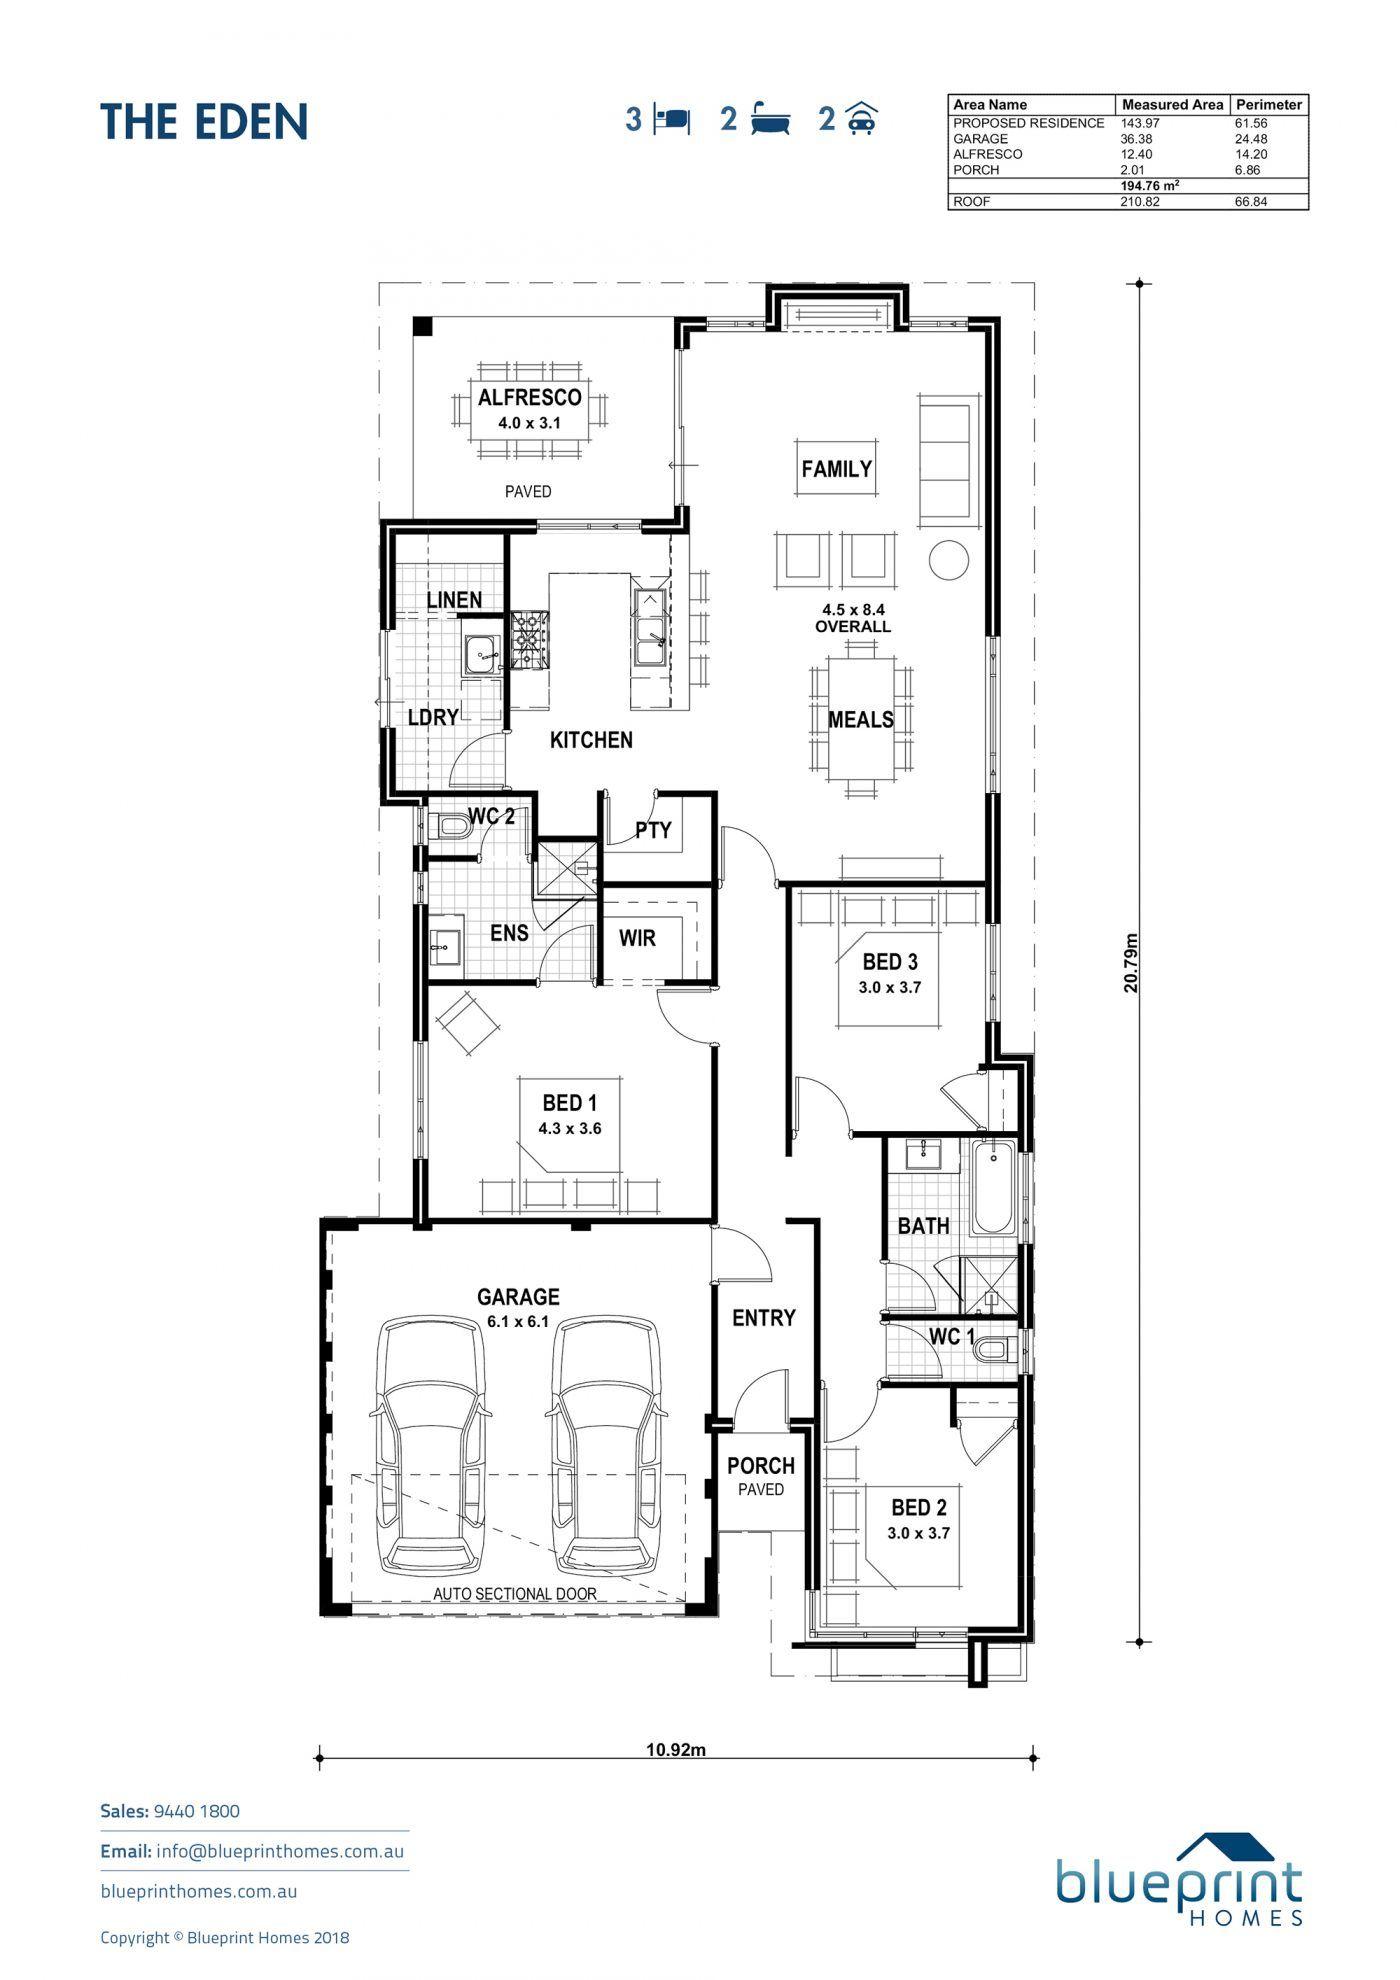 The Eden Perth Home Design Blueprint Homes House Design Bedroom House Plans Blueprints